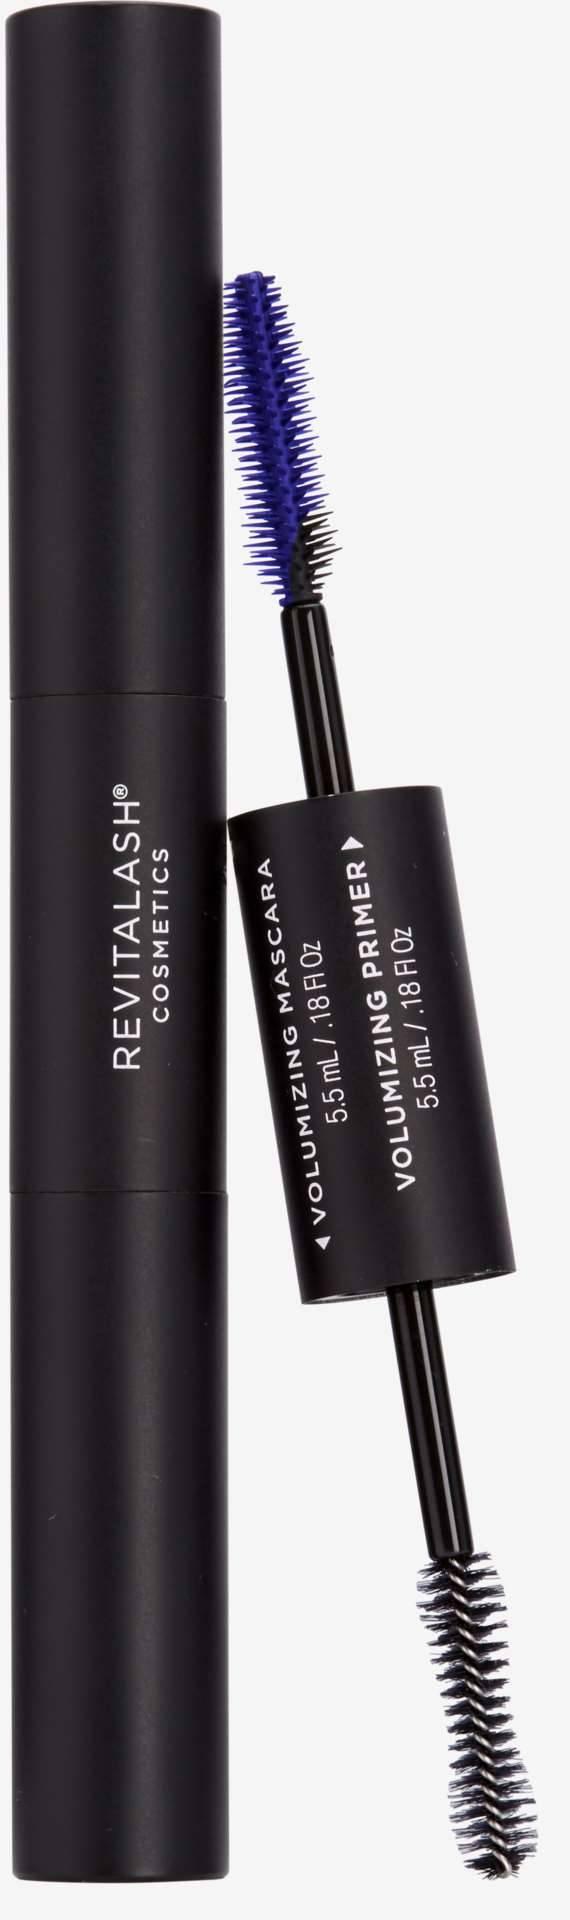 Revitalash Volumizing mascara and primer